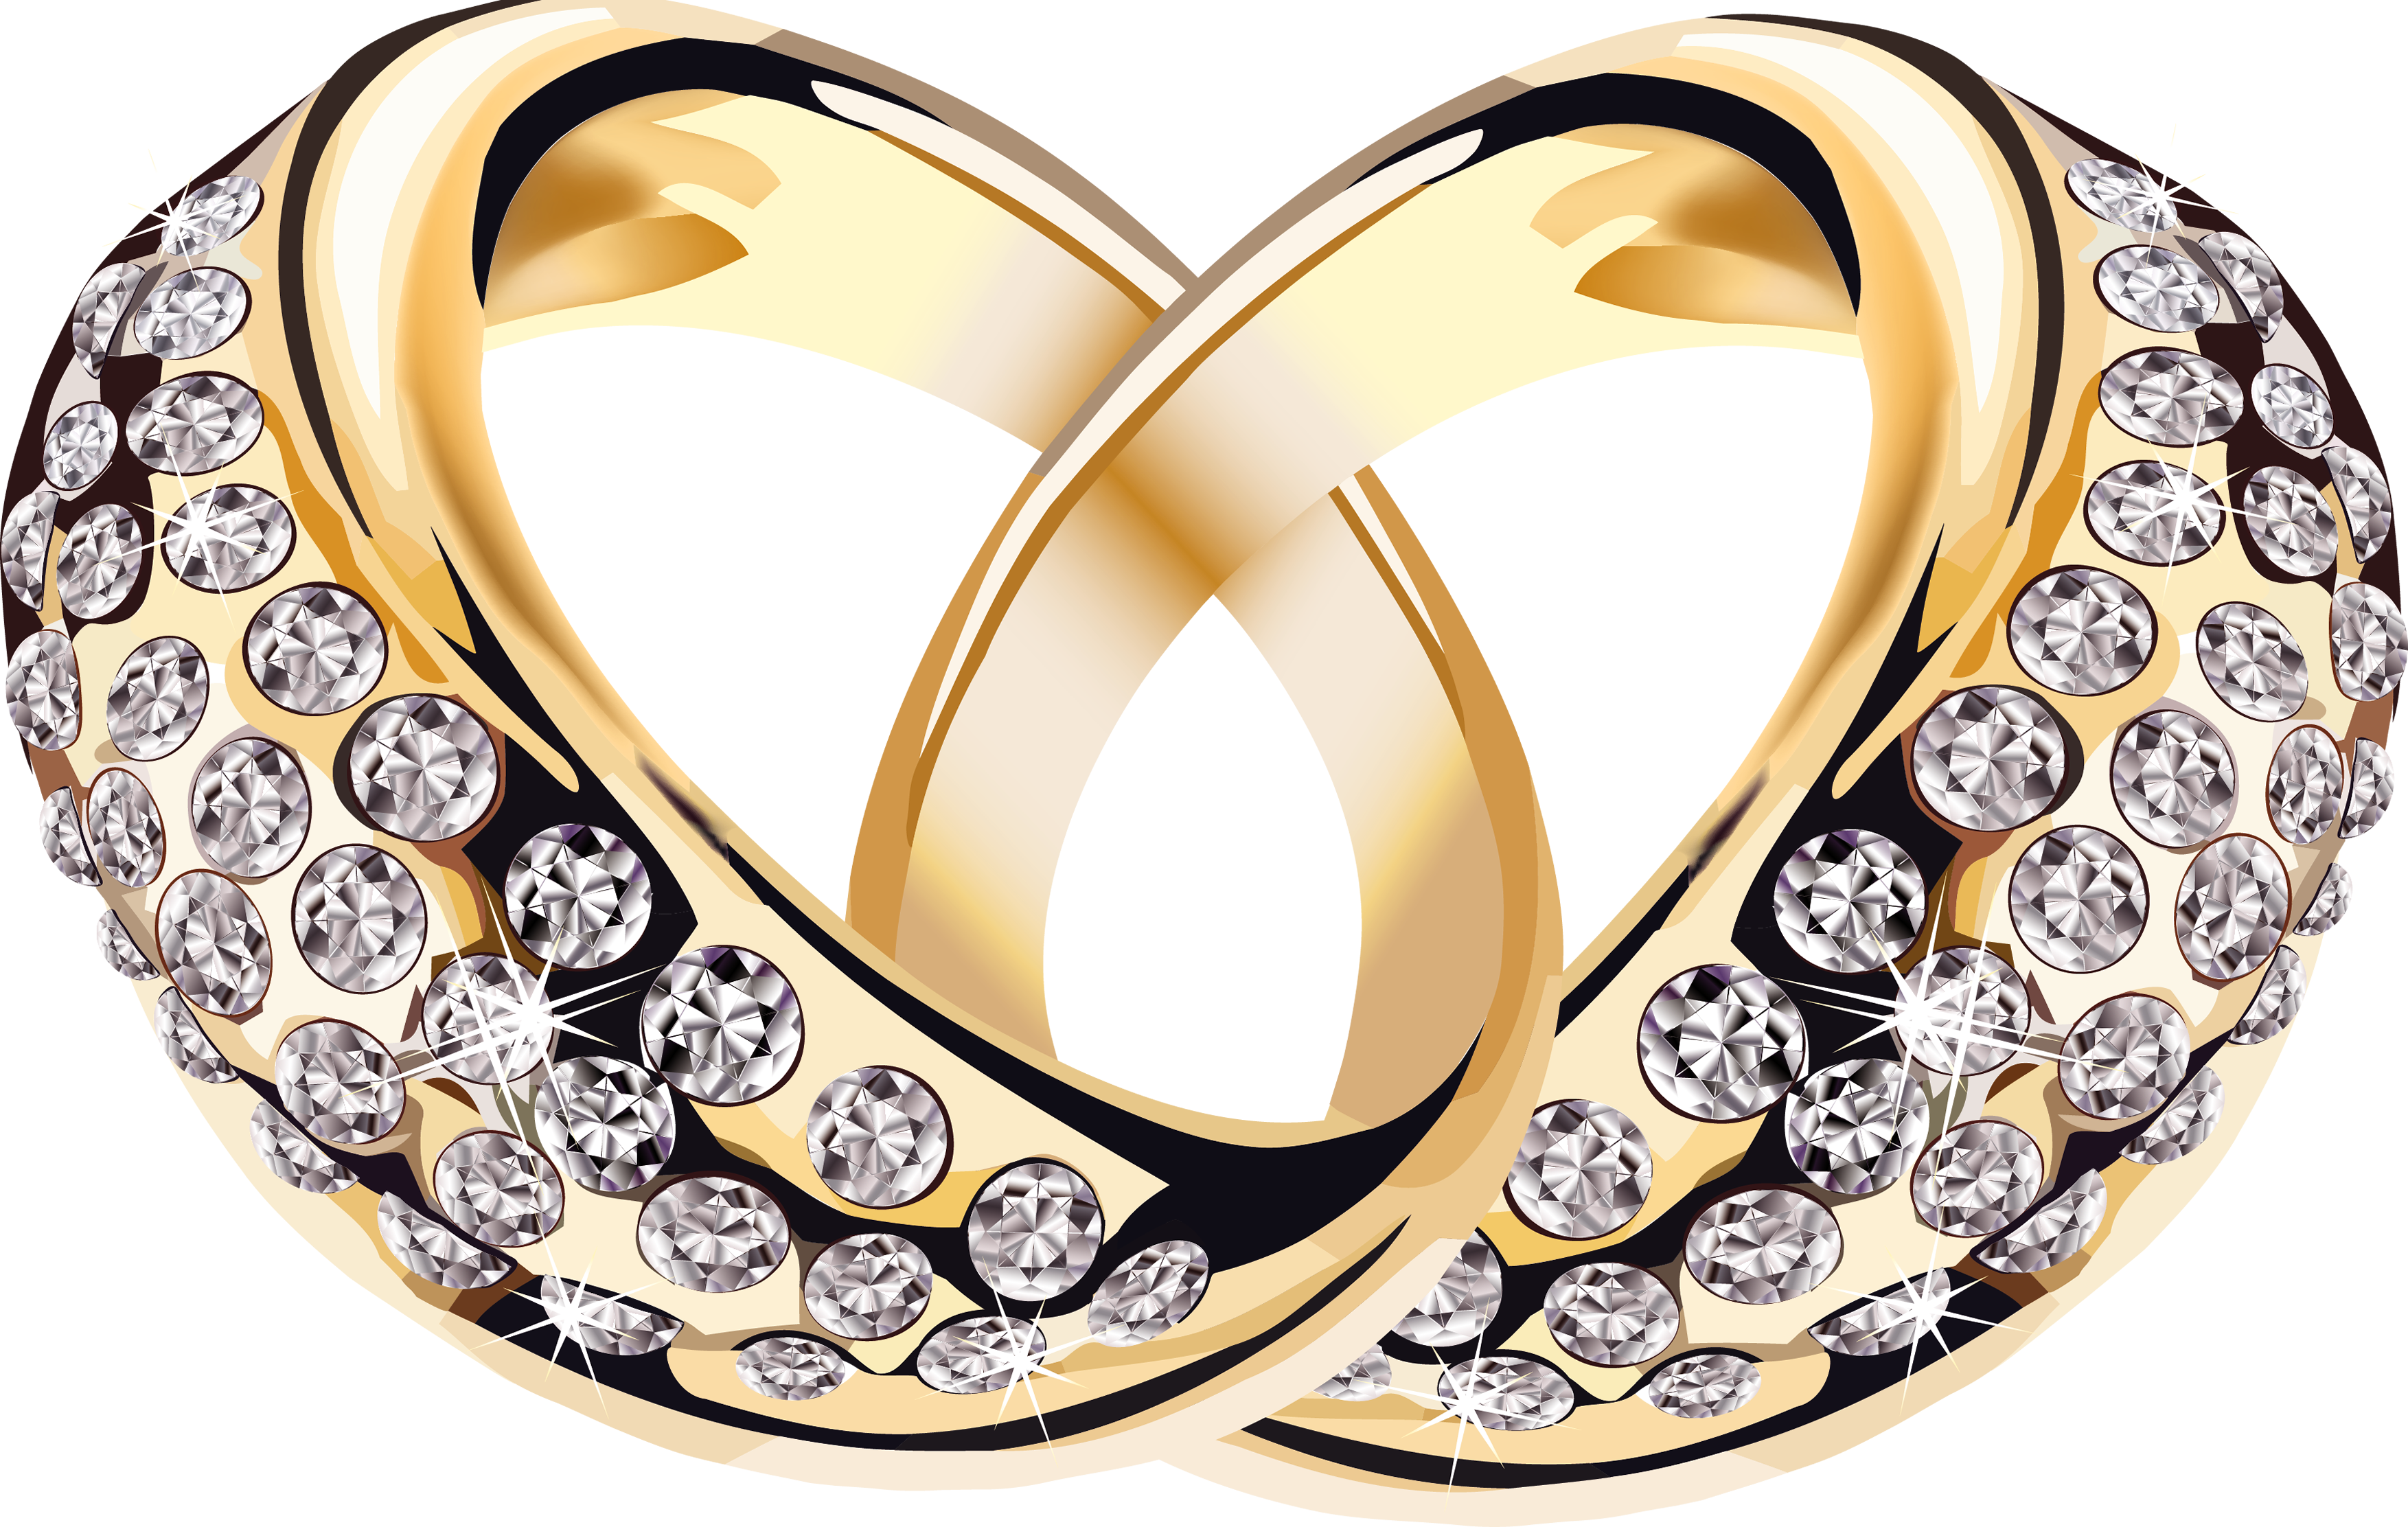 Wedding ring pandora clip. Gem clipart bling